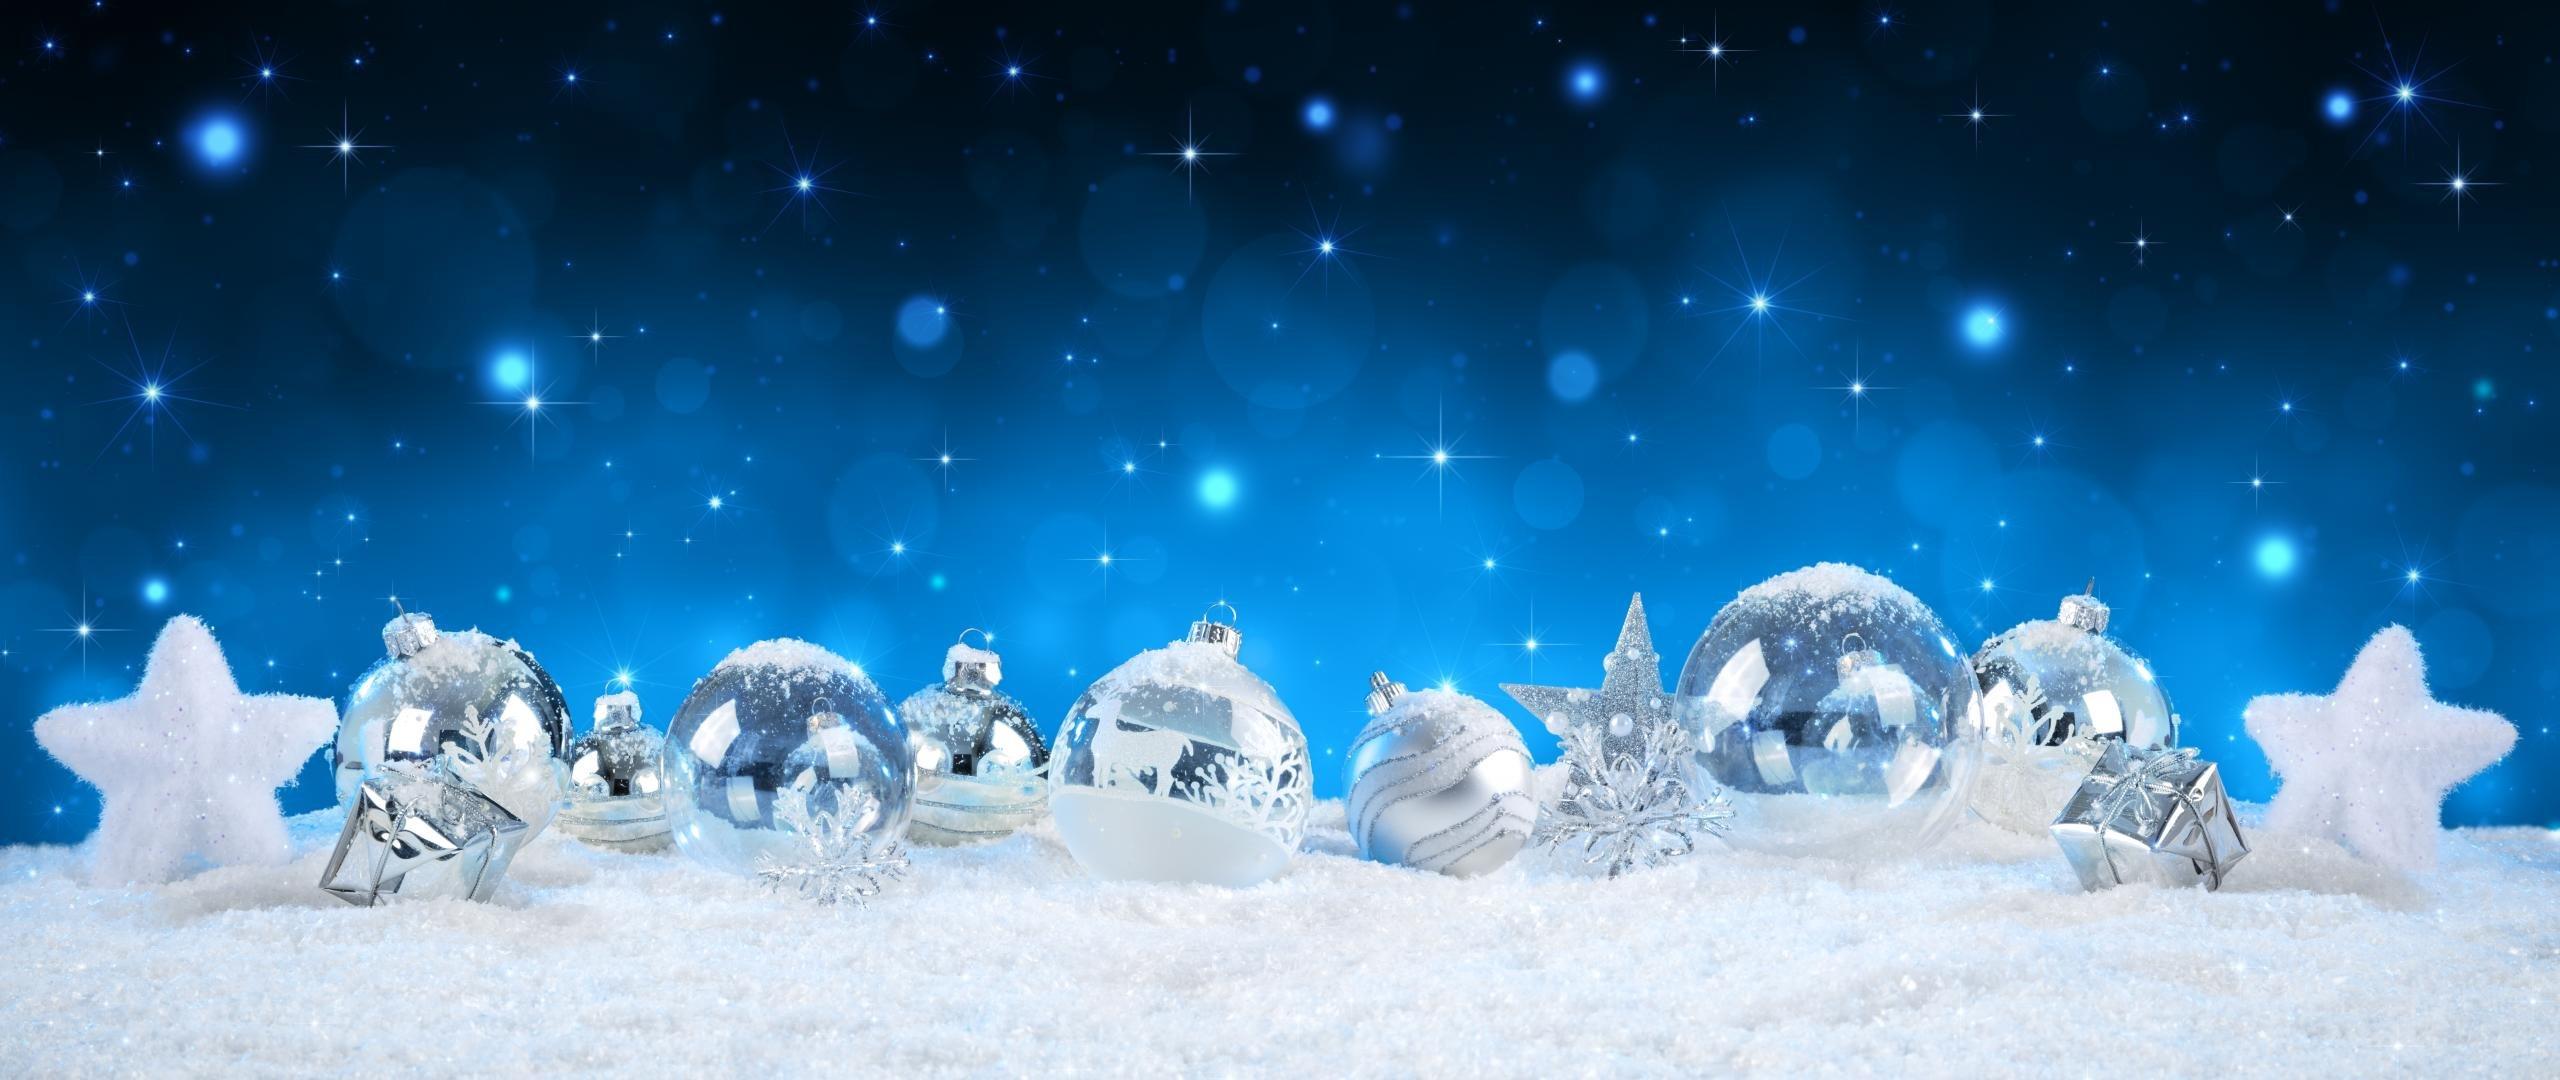 High Resolution Christmas Hd 2560x1080 Wallpaper Id433698